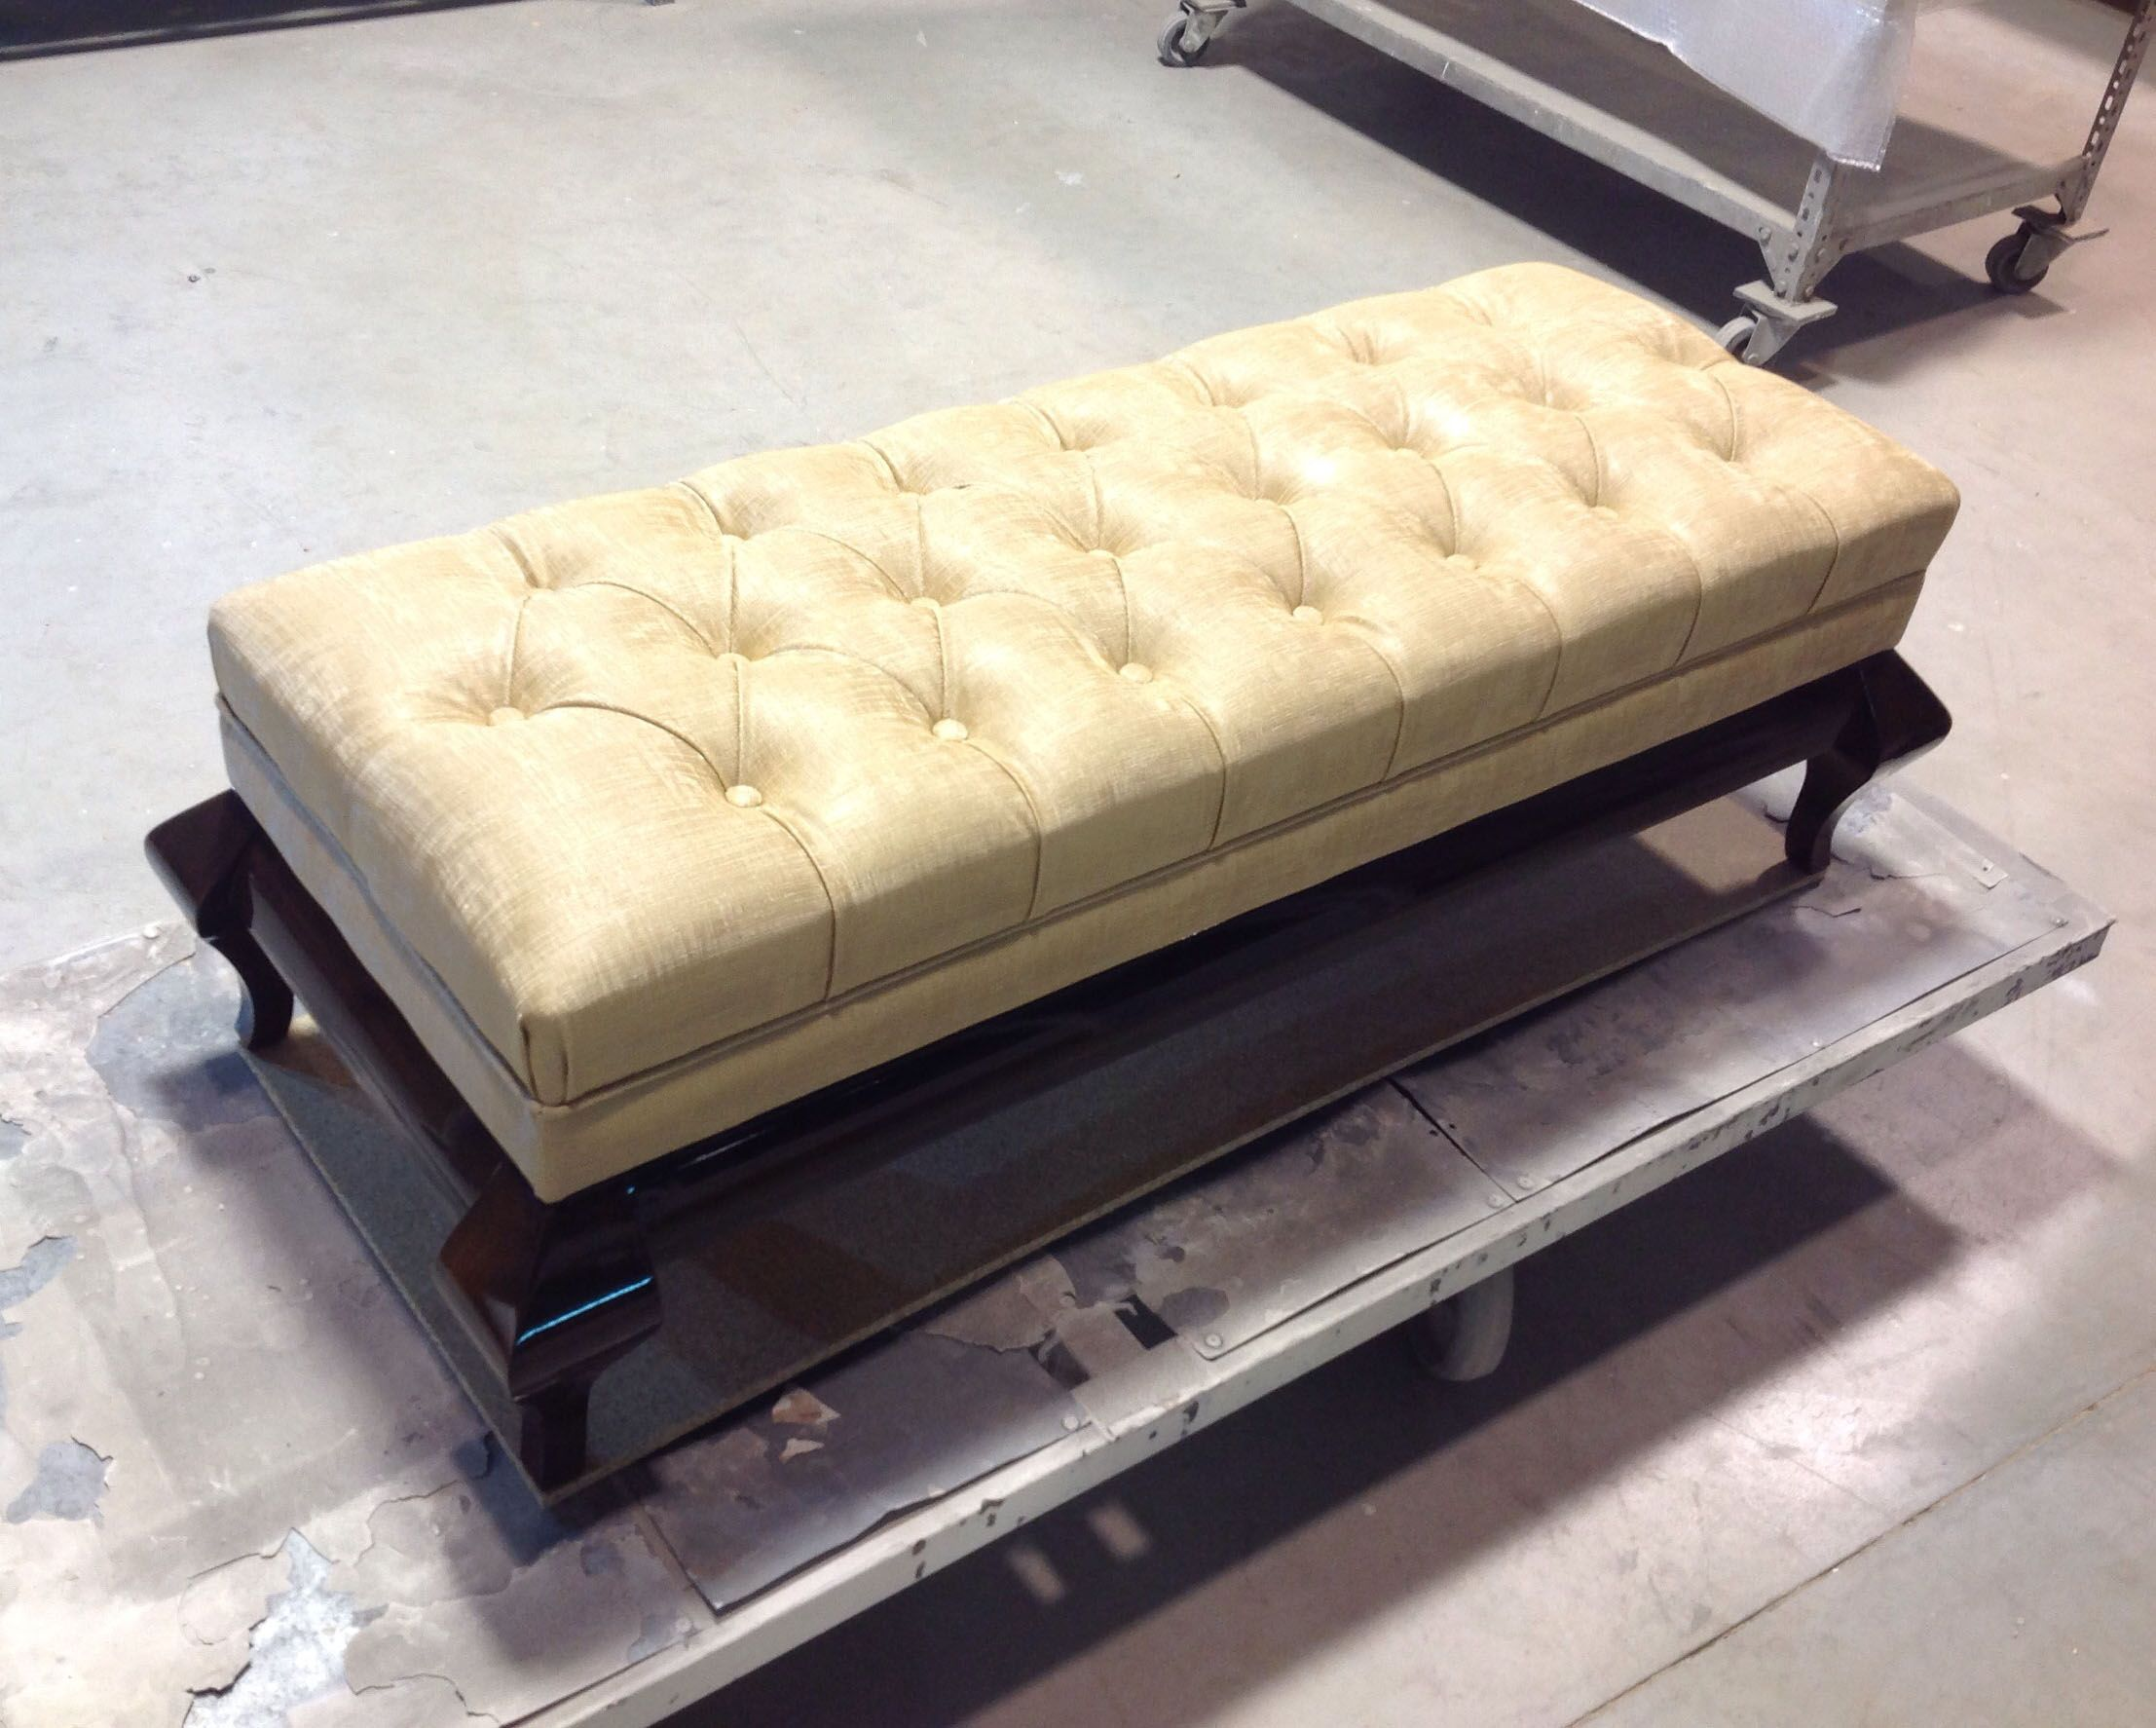 Upholstered capitone bedroom upholstered bench